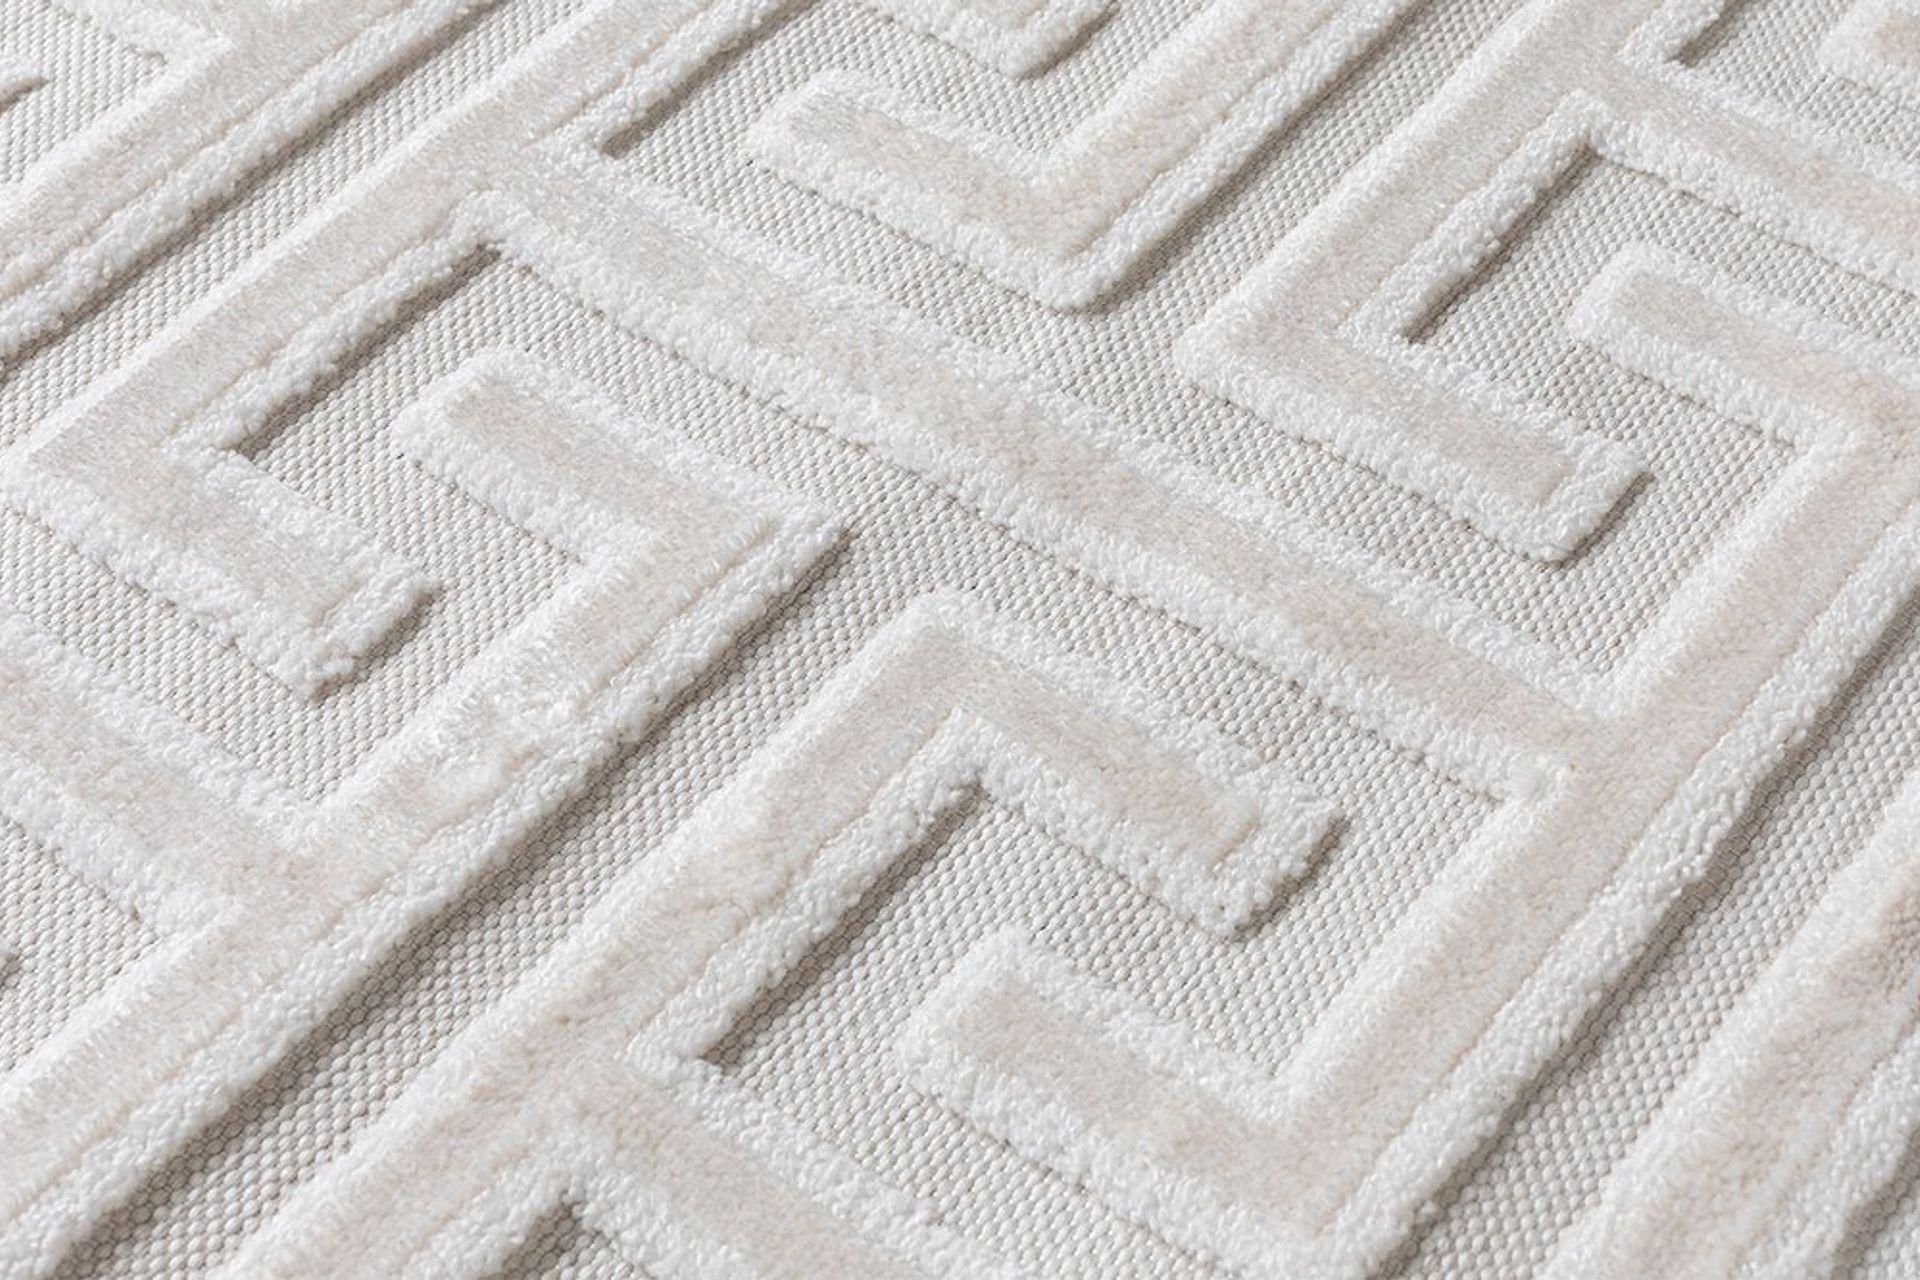 Julie Greek Key Woven Rug, 133 x 190, White